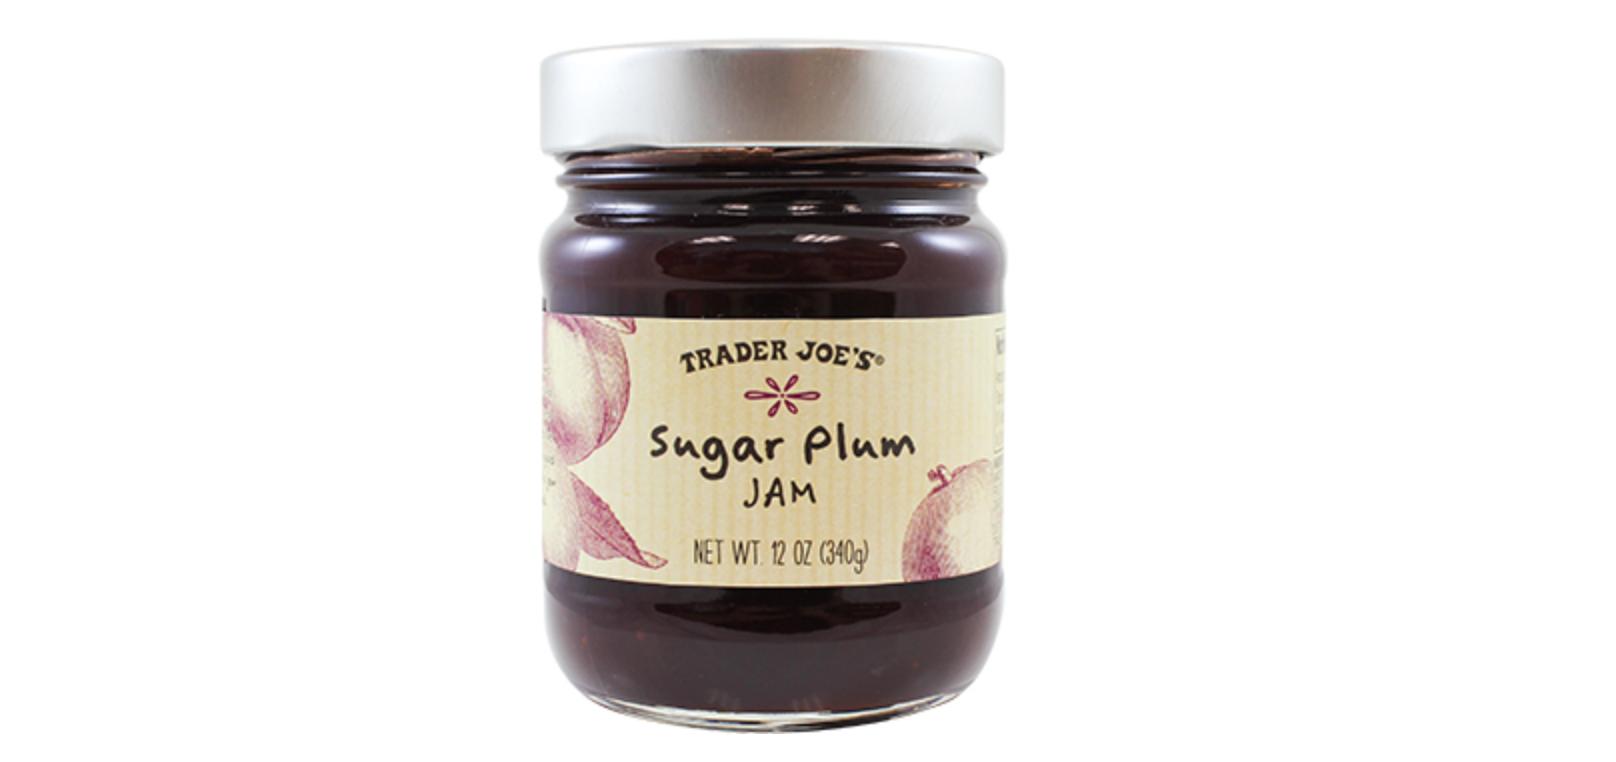 Trader Joes Sugar Plum Jam